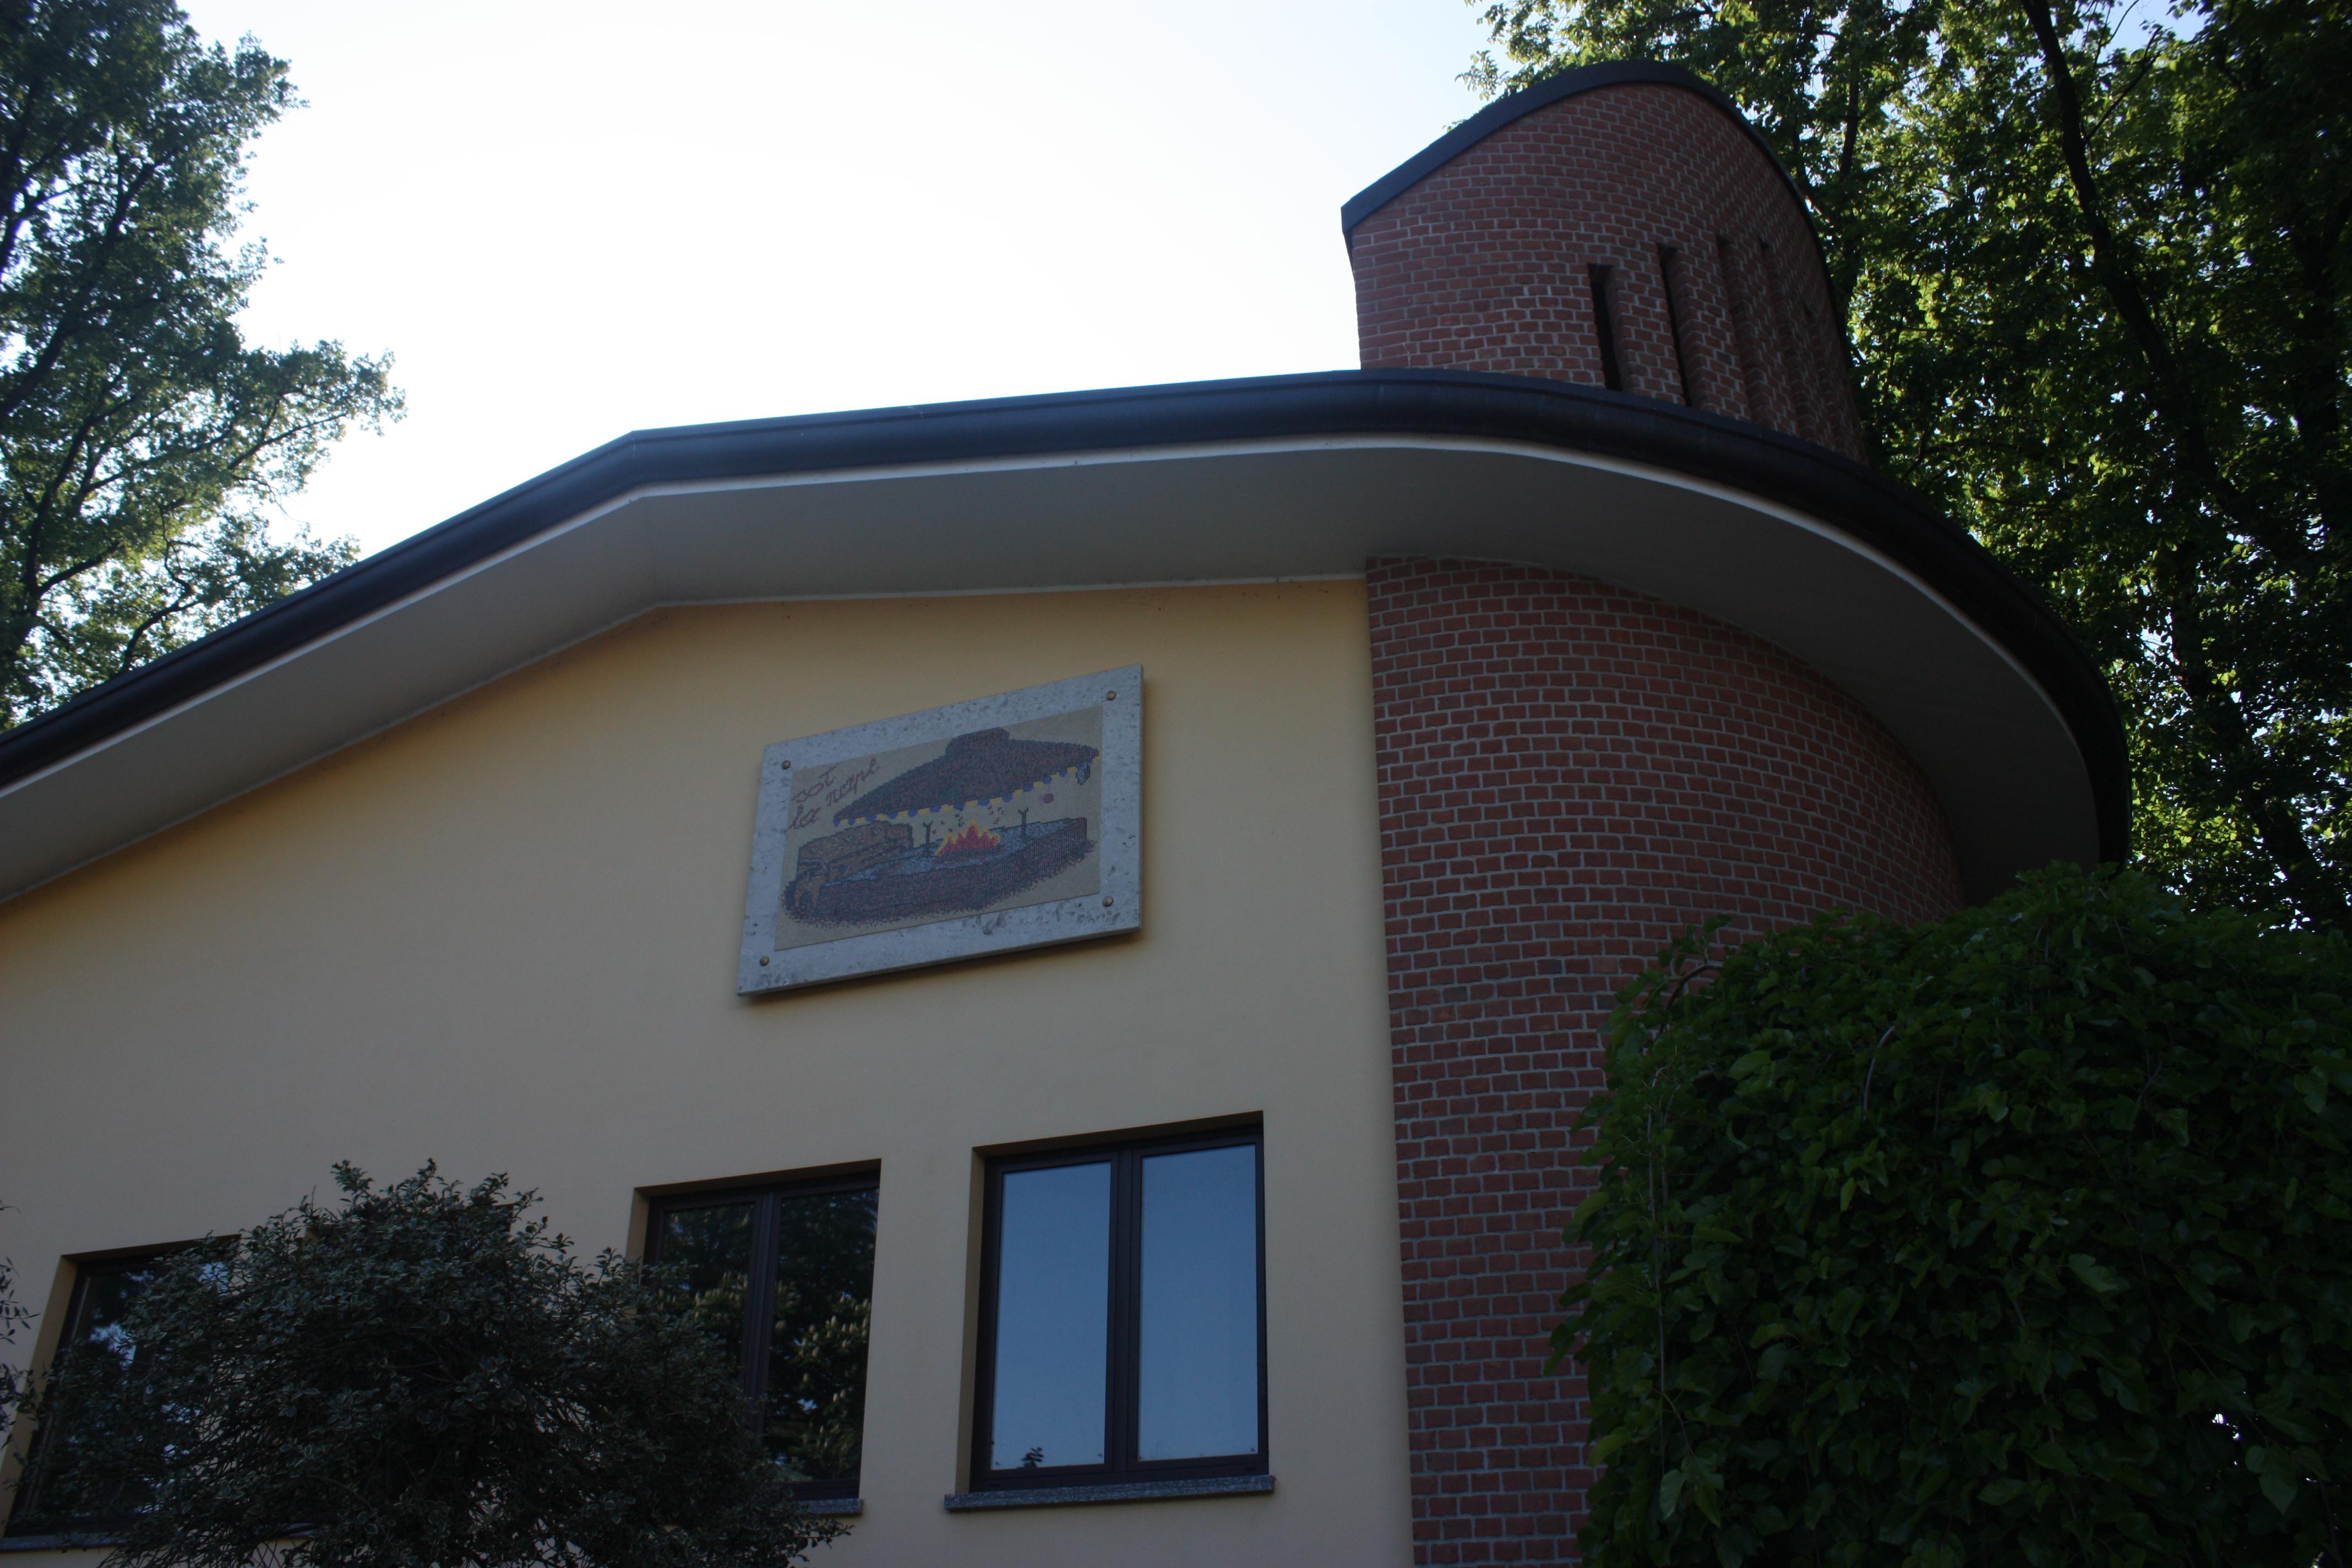 vista esterna